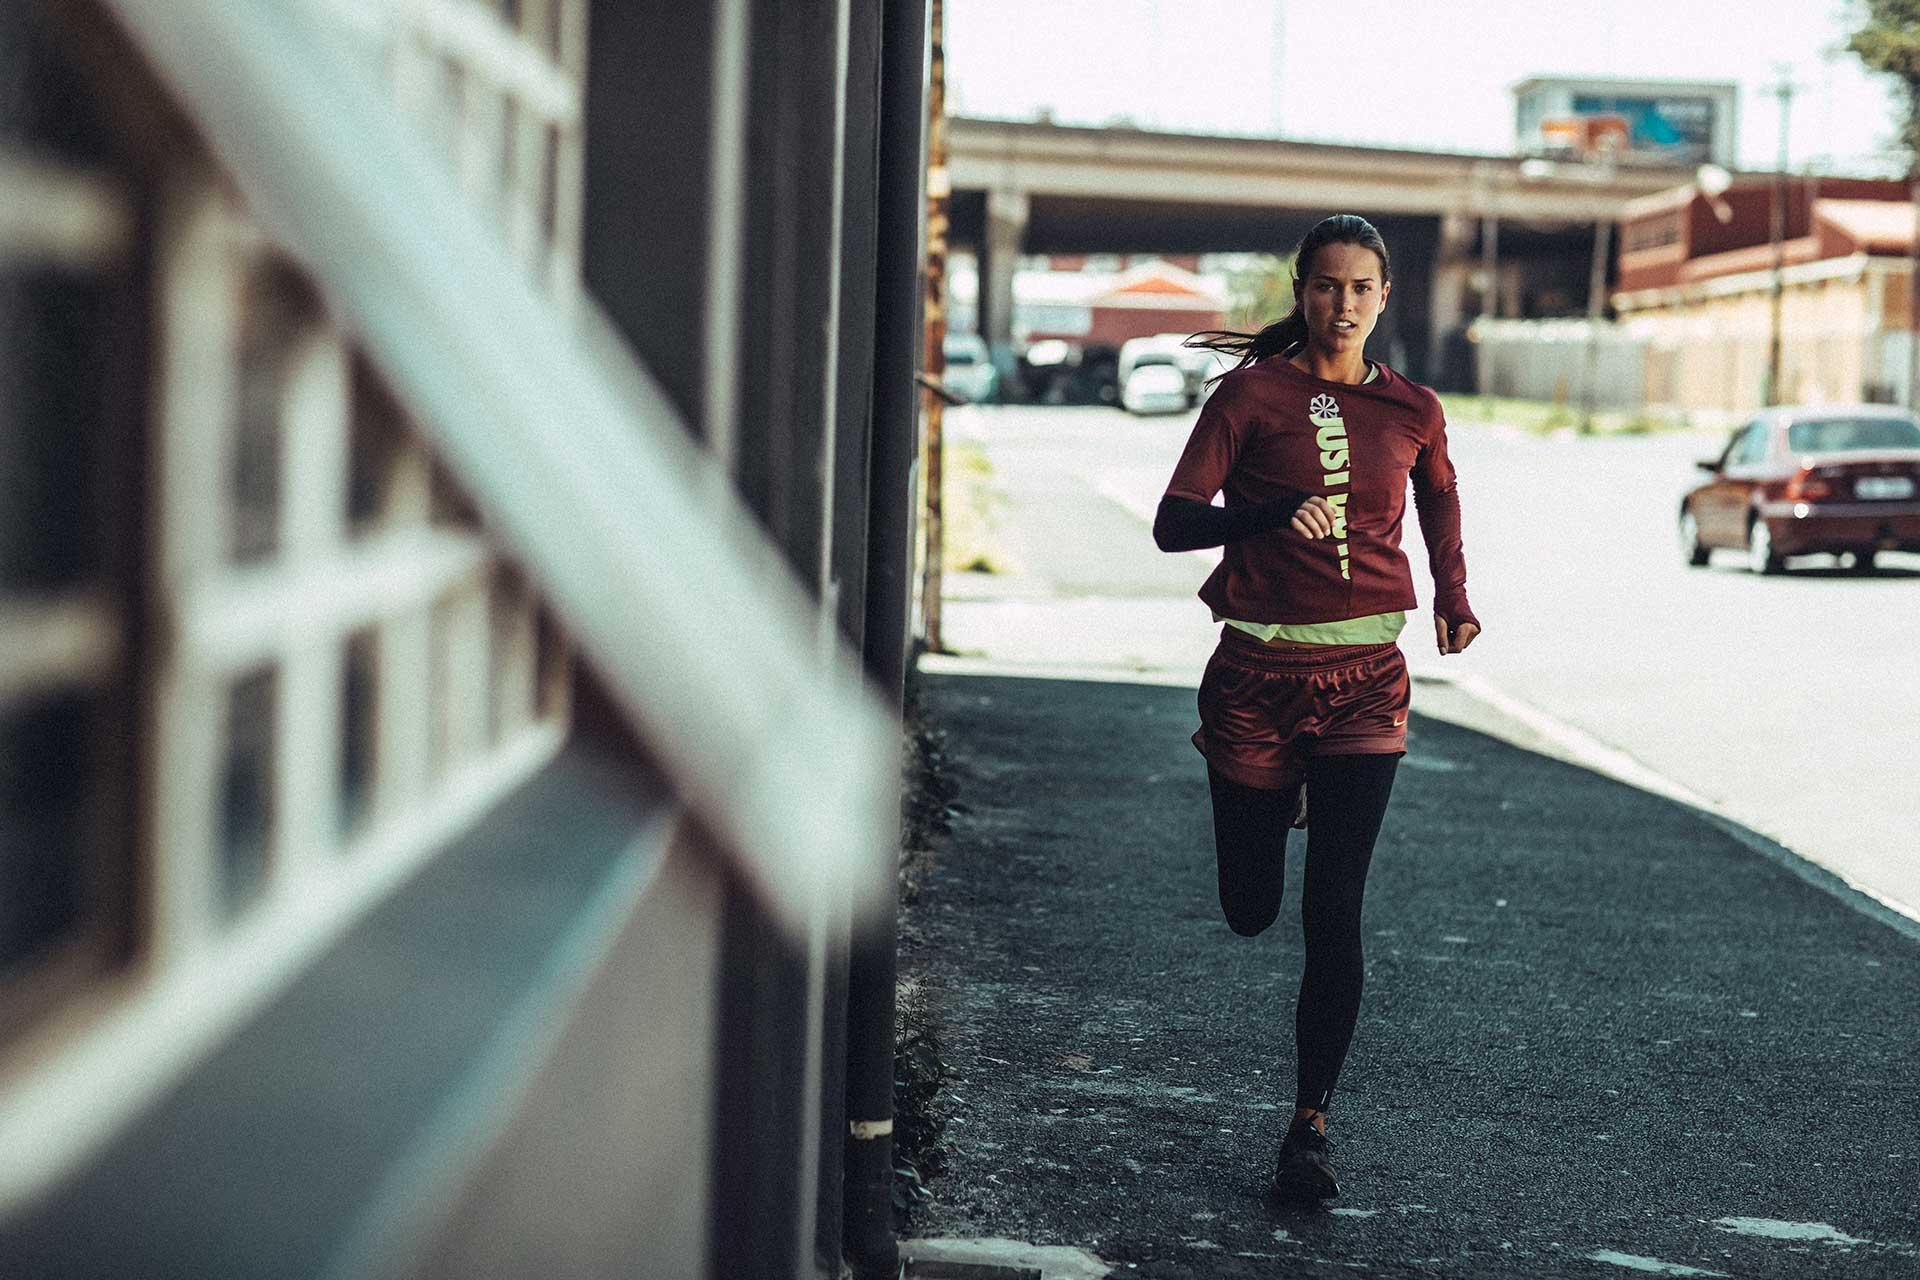 Dynafit Sport Bekleidung Running Urban Woodstock Kapstadt Michael Müller